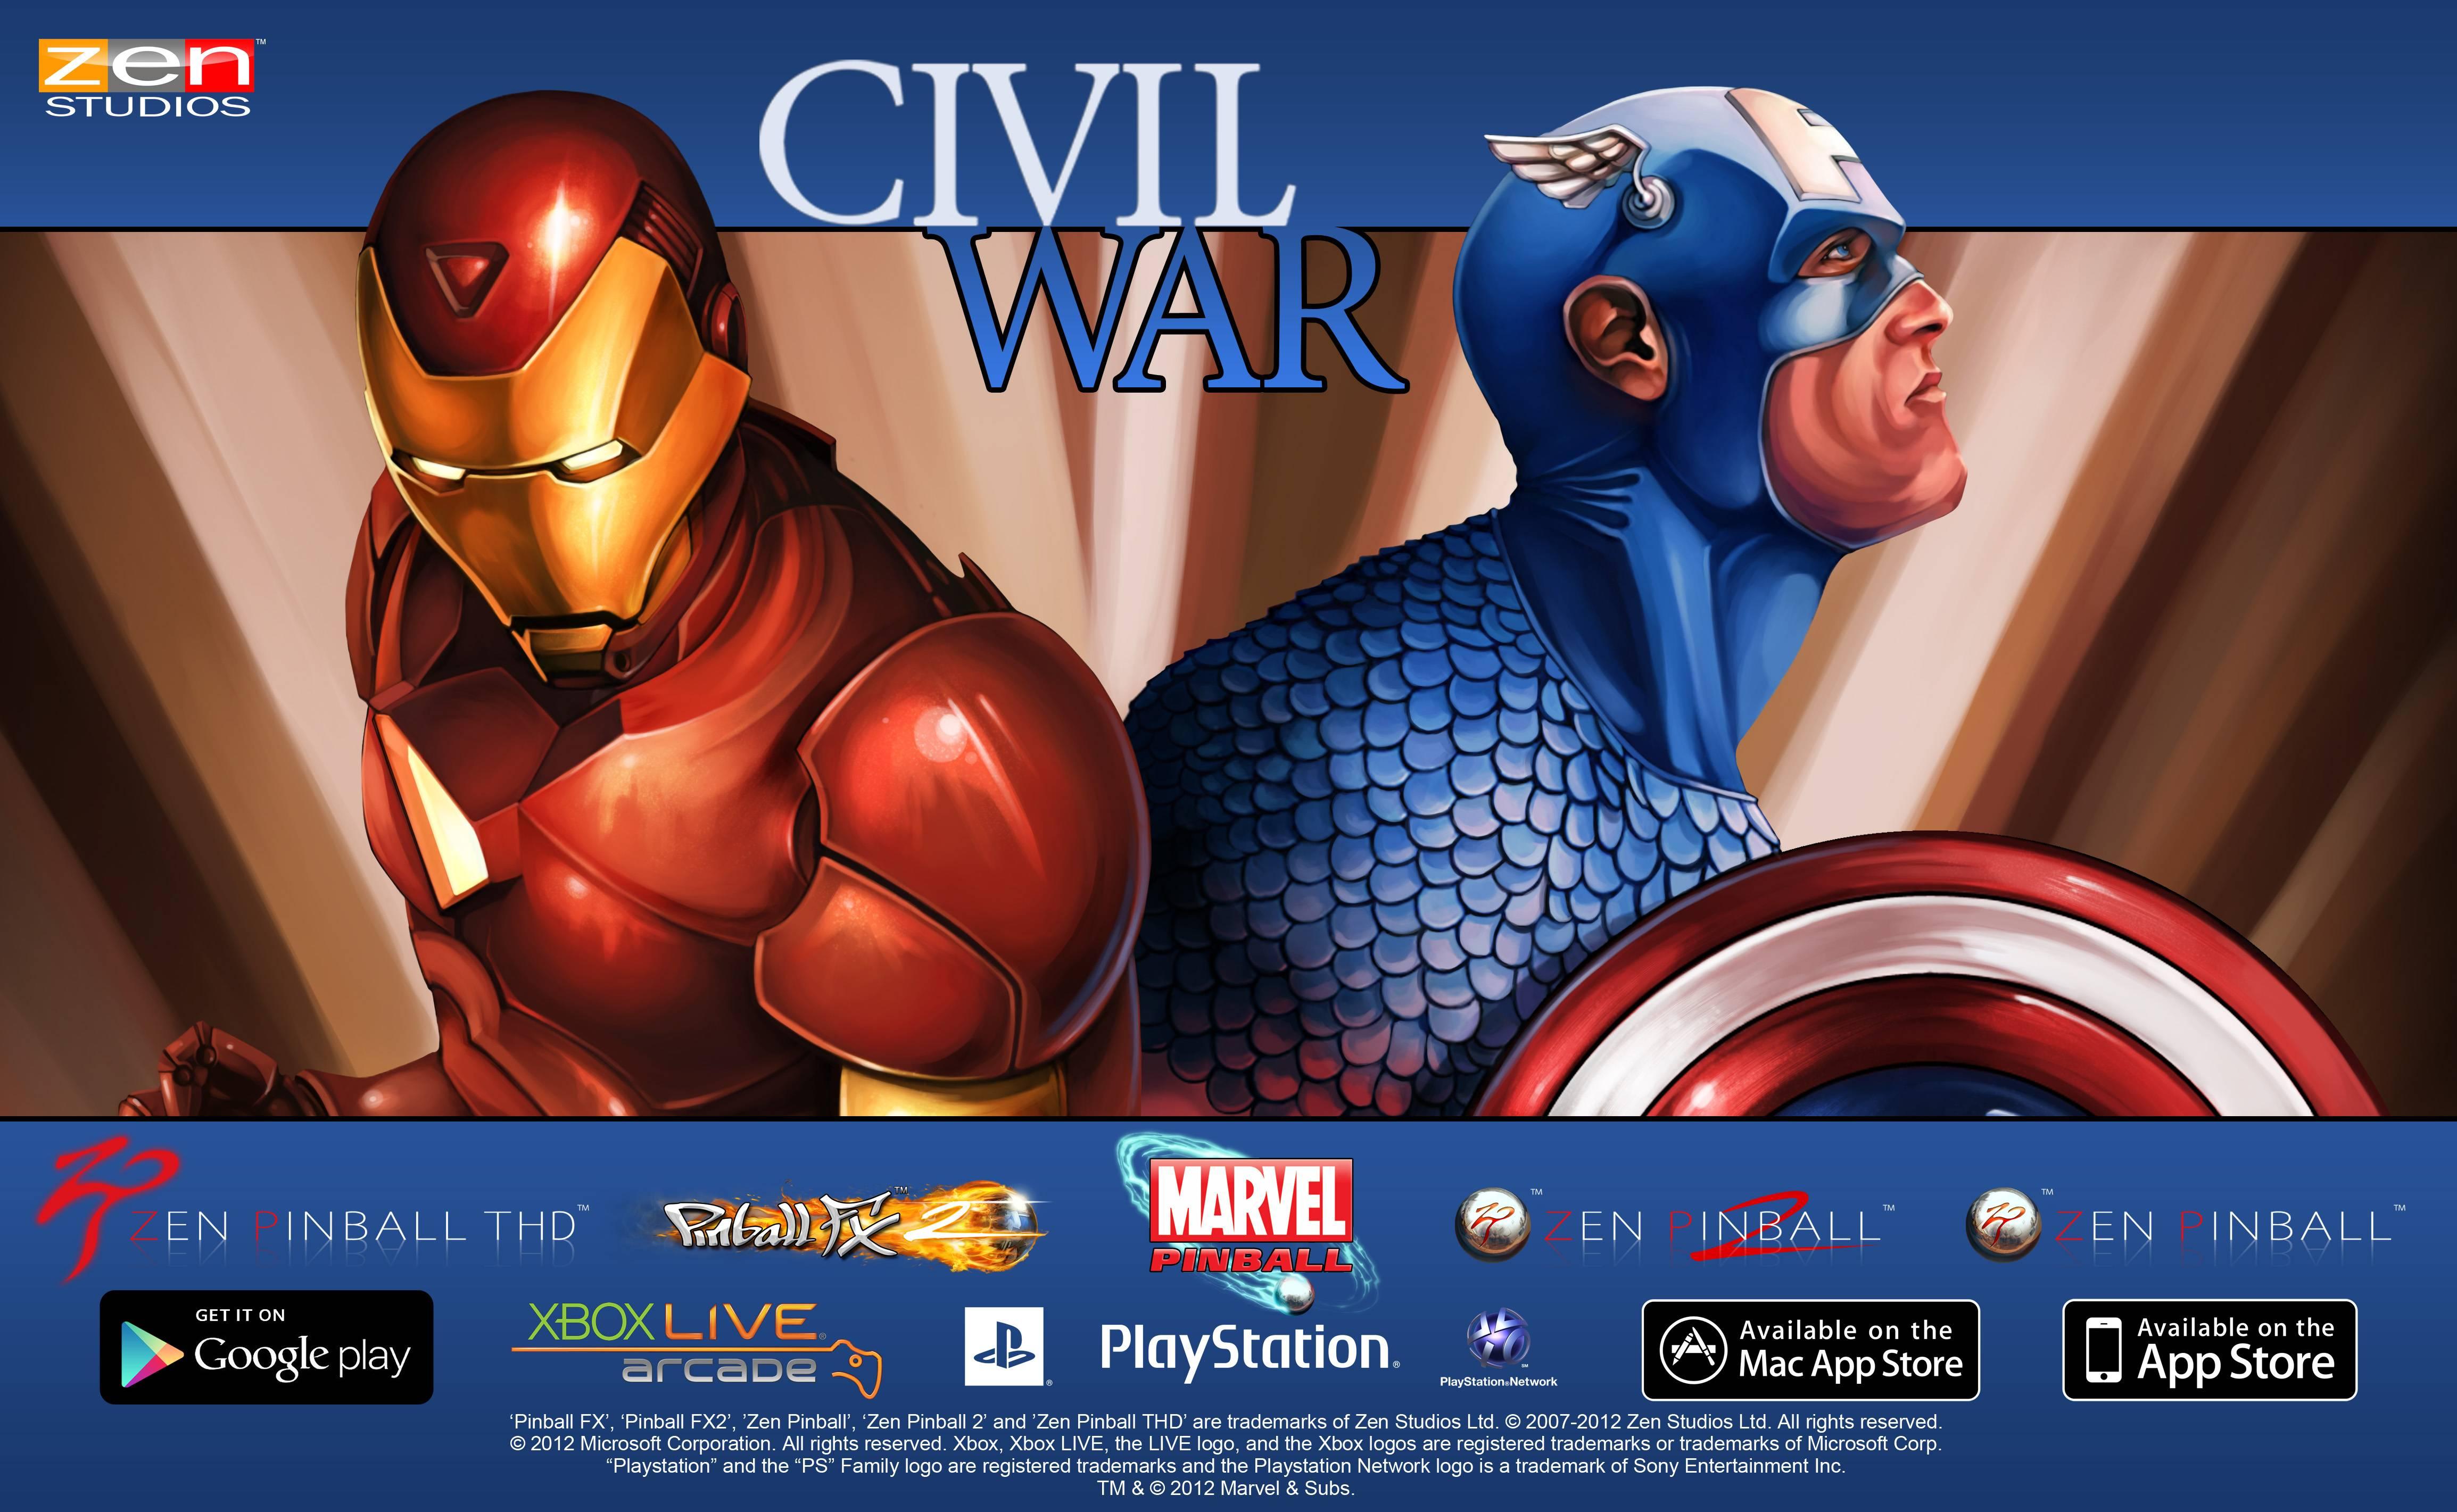 Civil war porn vids cartoon images